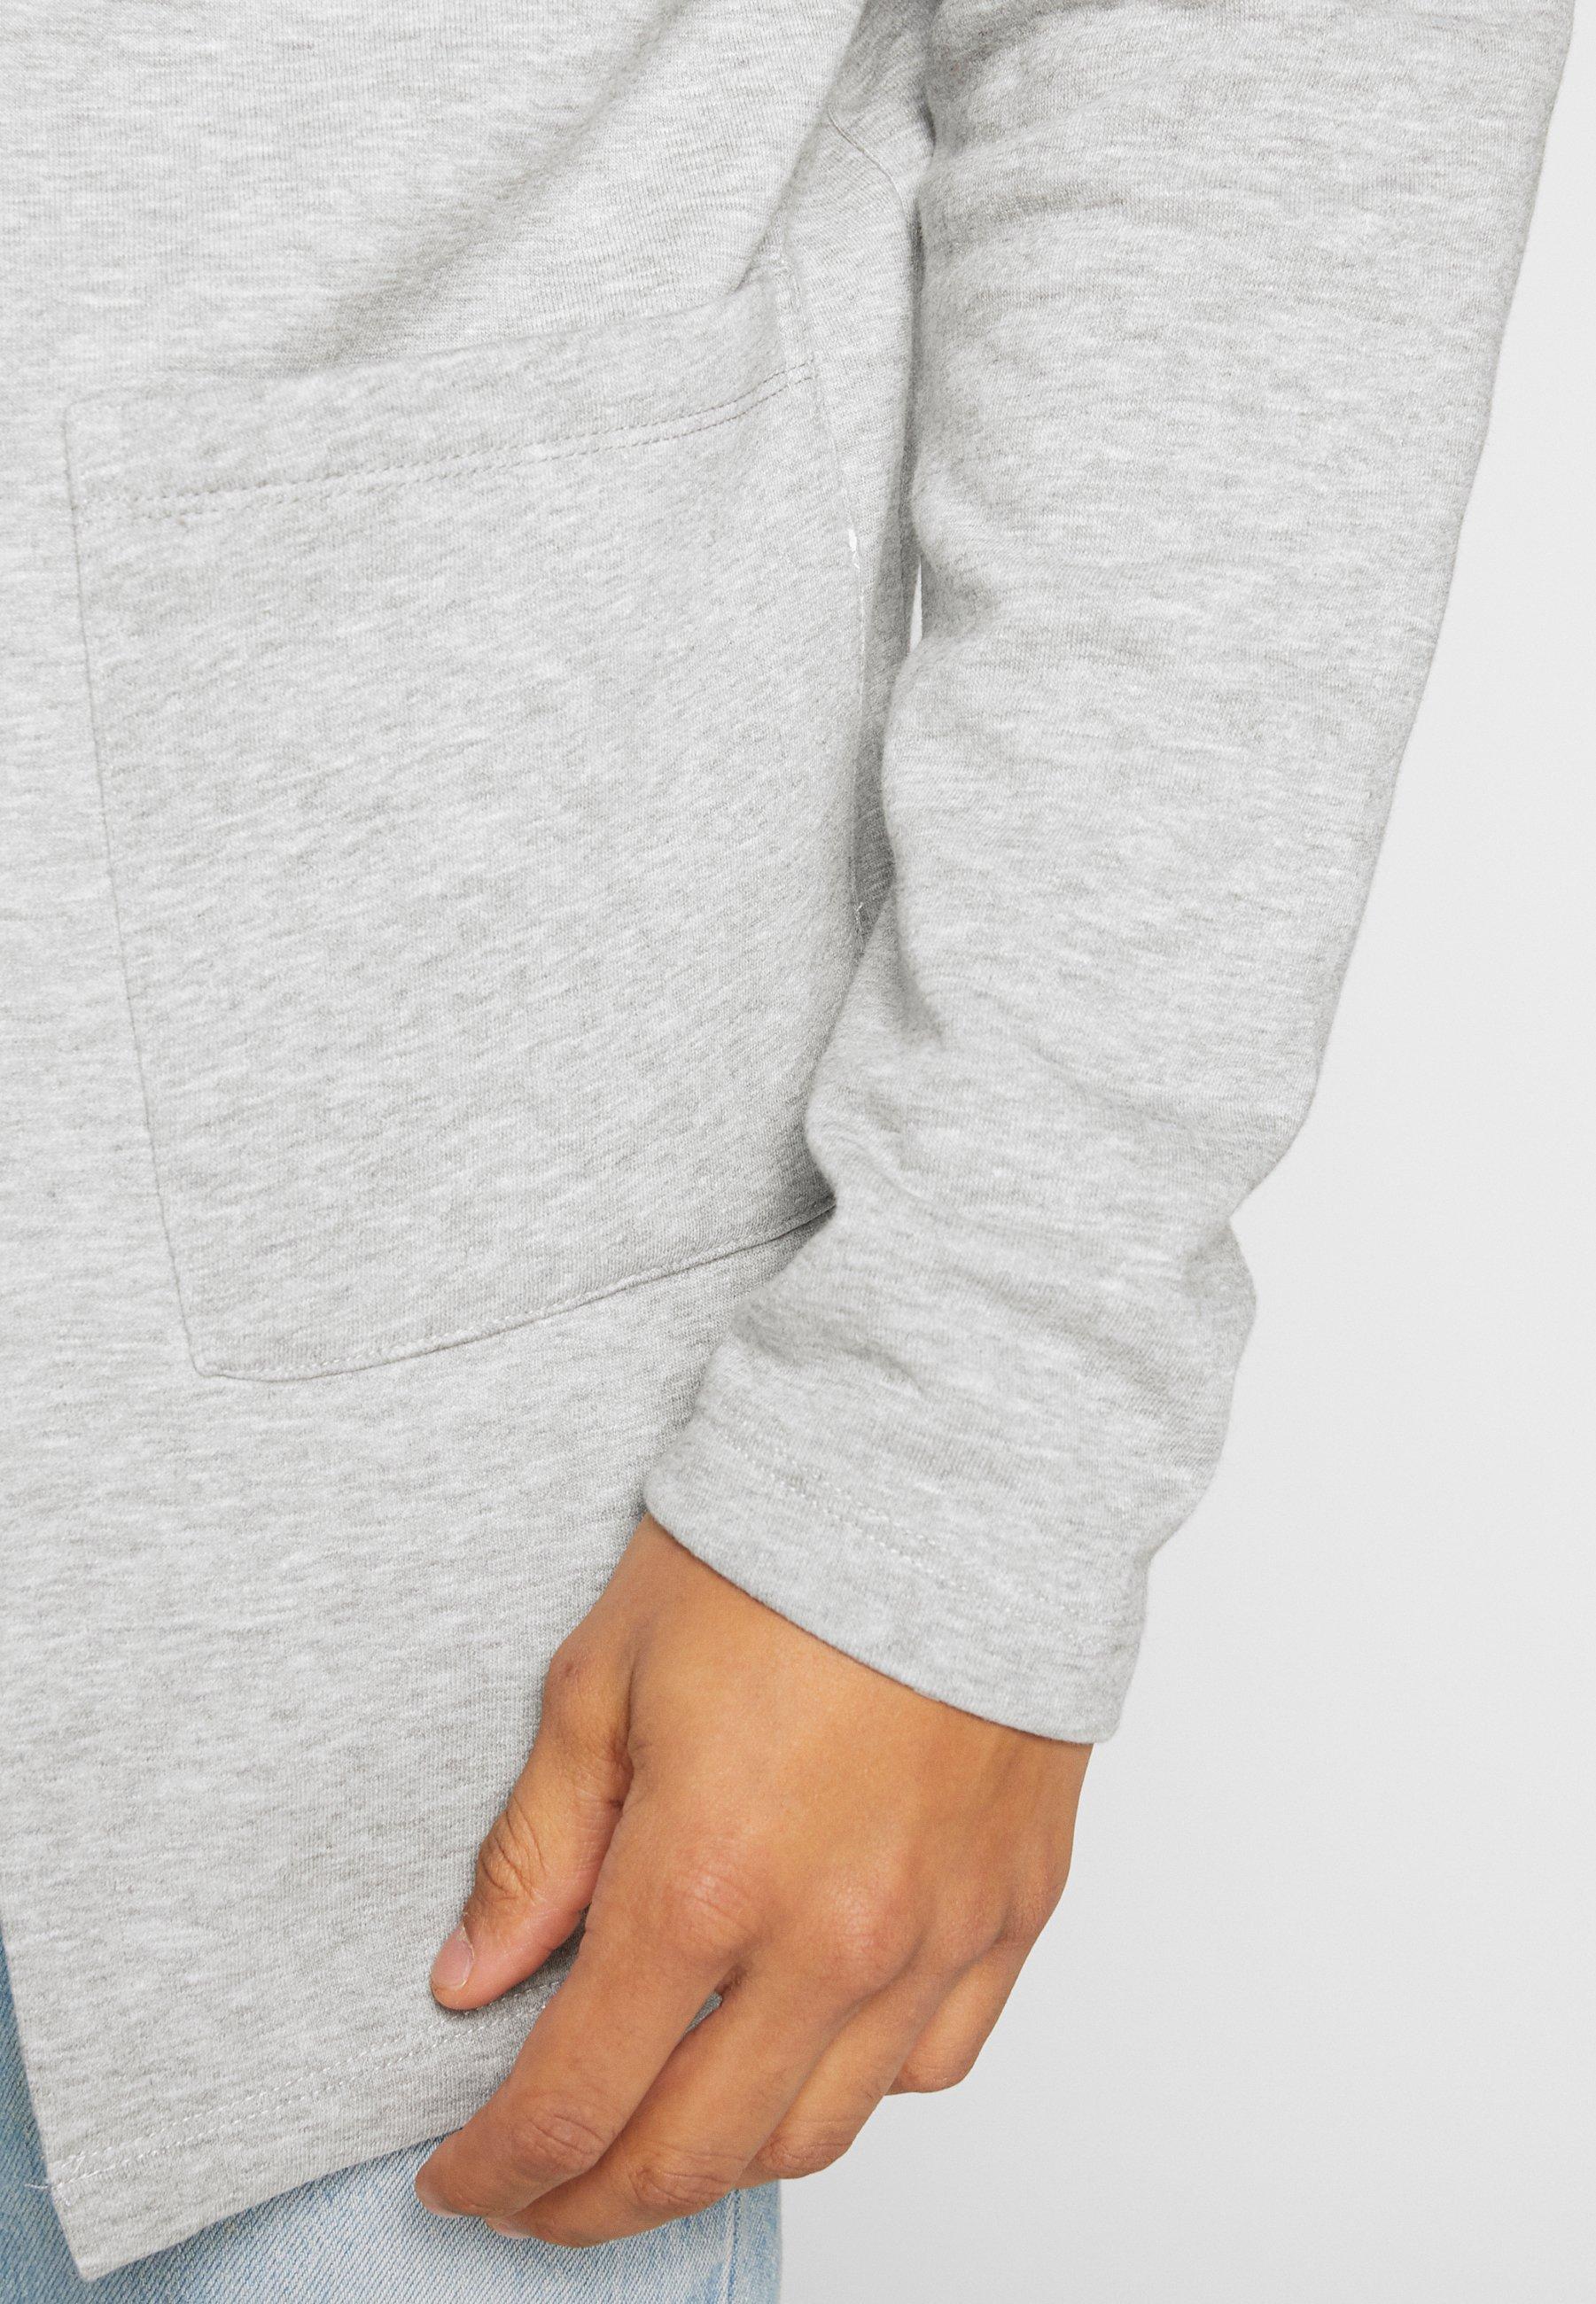 Denim Project Lala - Zip-up Hoodie Mottled Light Grey UK